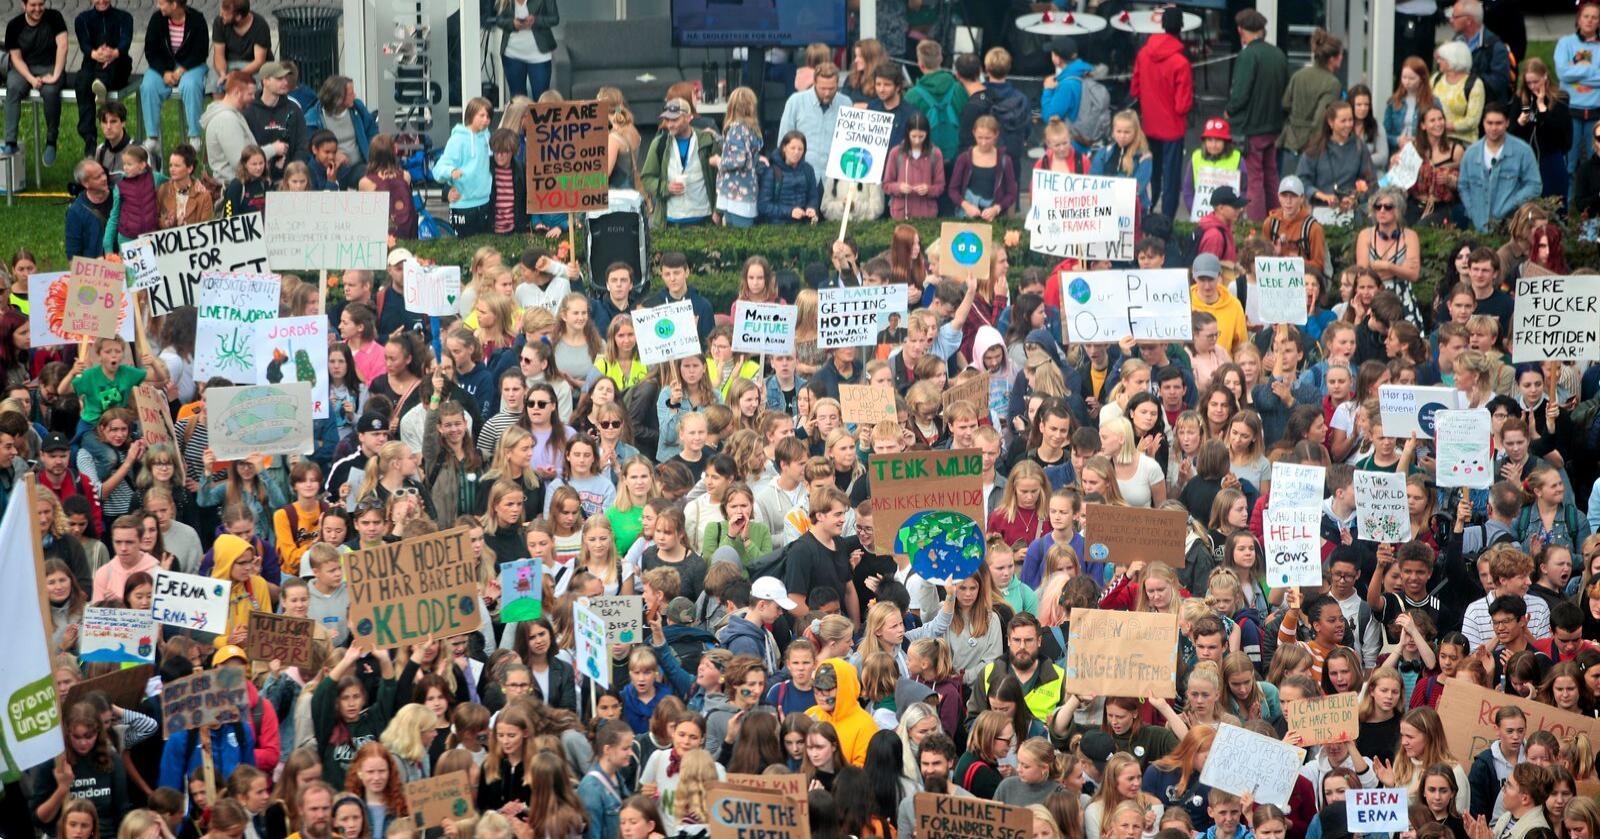 Klimastreik: Det har blitt arrangert klimastreik over 100 stader i 2019. Foto: Håkon Mosvold Larsen / NTB scanpix